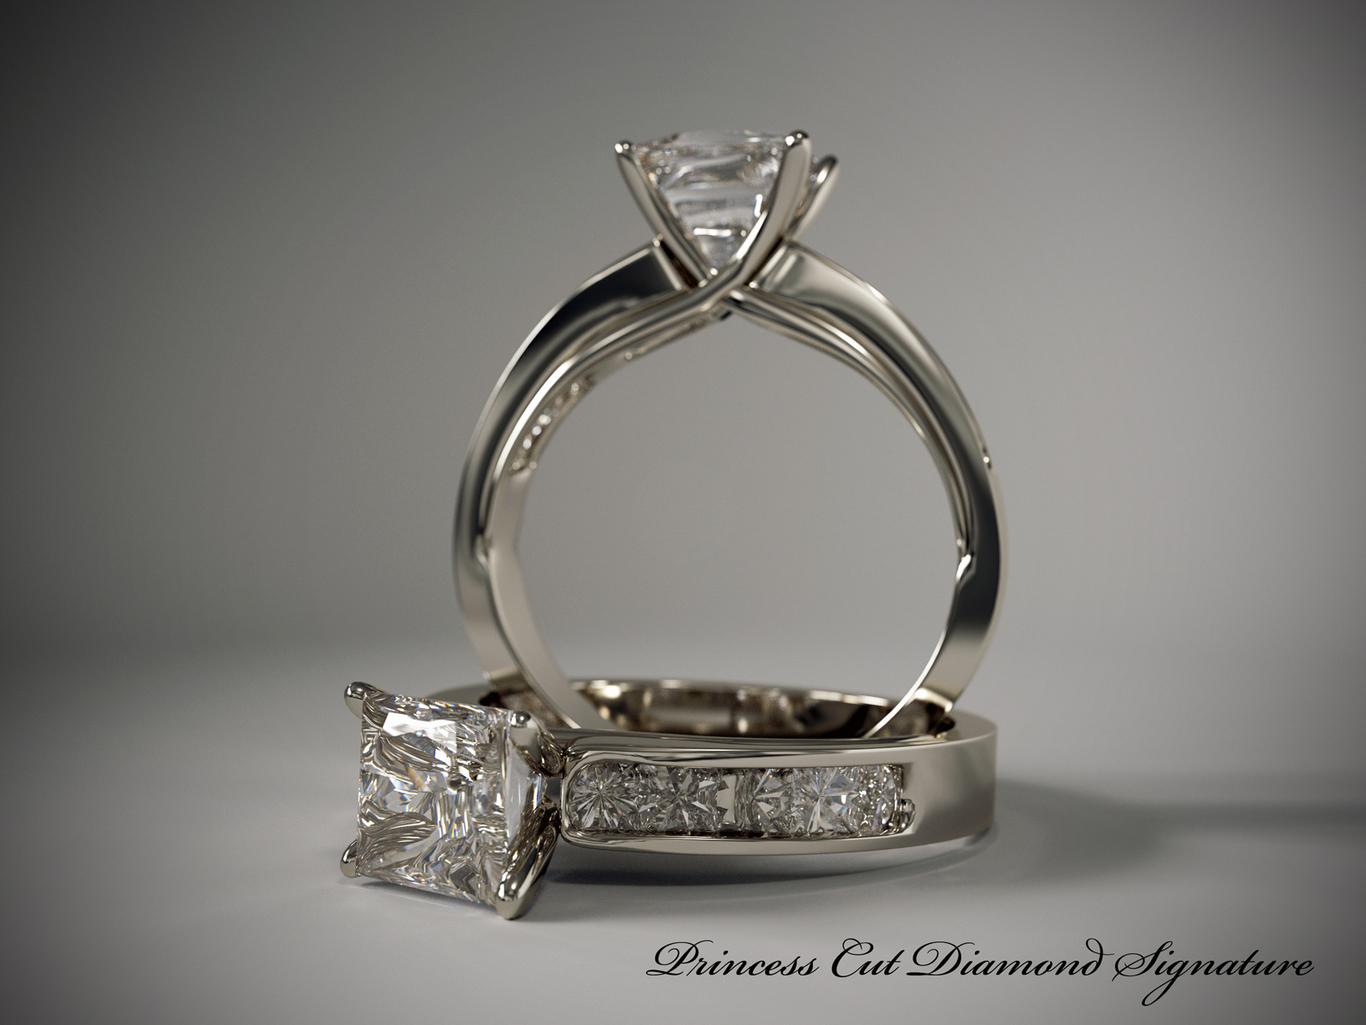 Acg0501 princess cut diamond 1 51f63eec h1zu